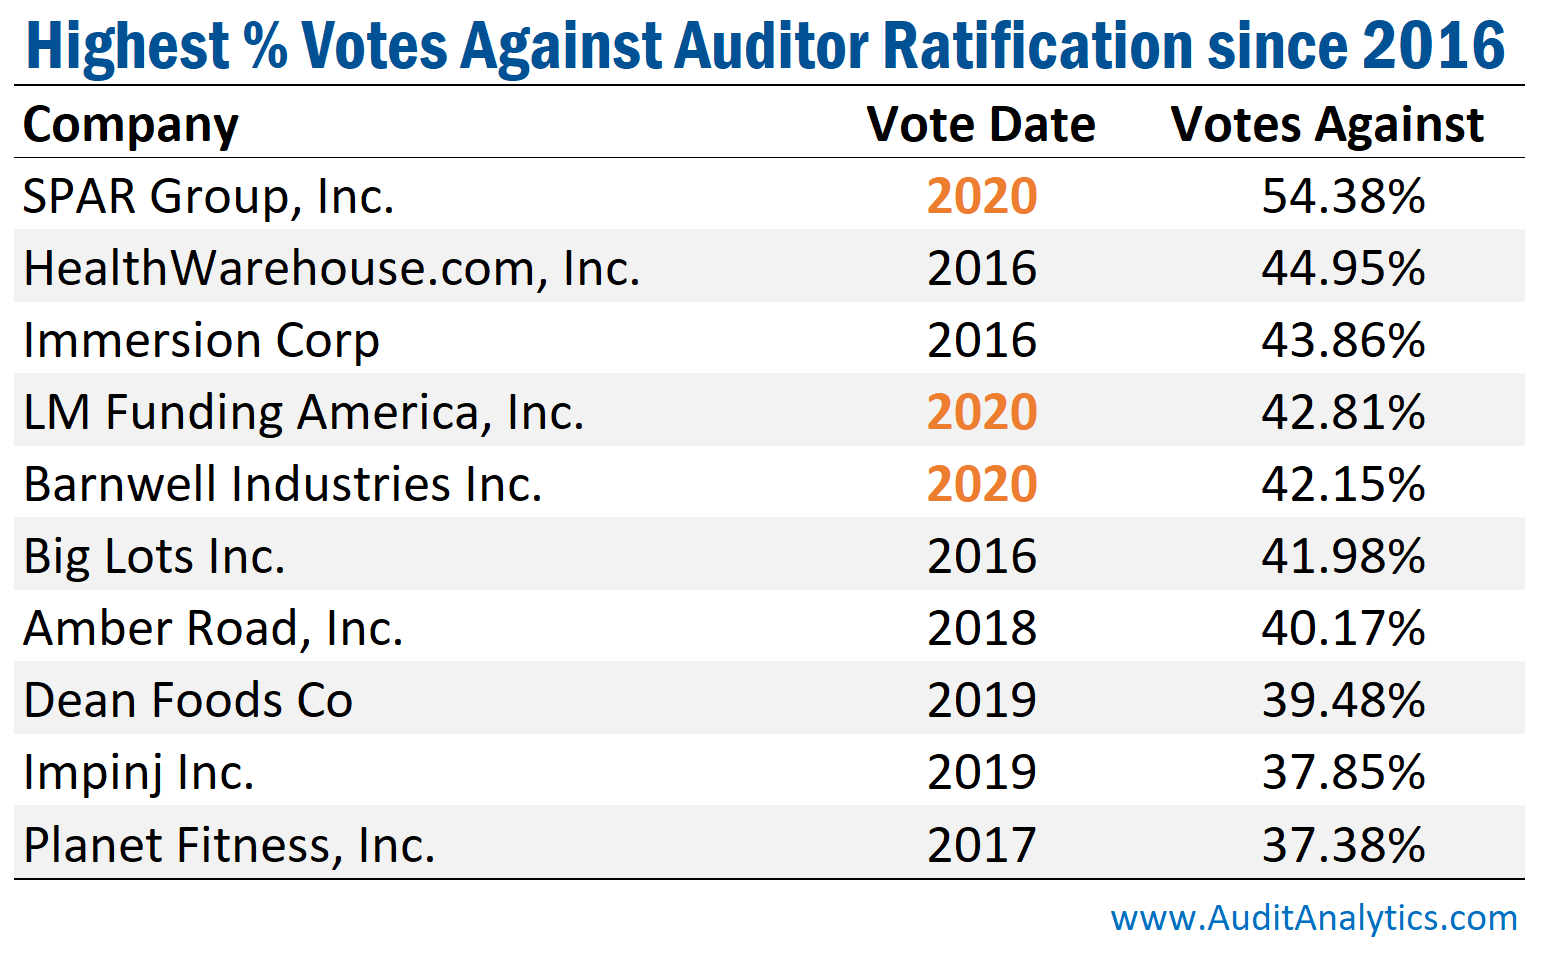 Highest percent votes against auditor ratification since 2016